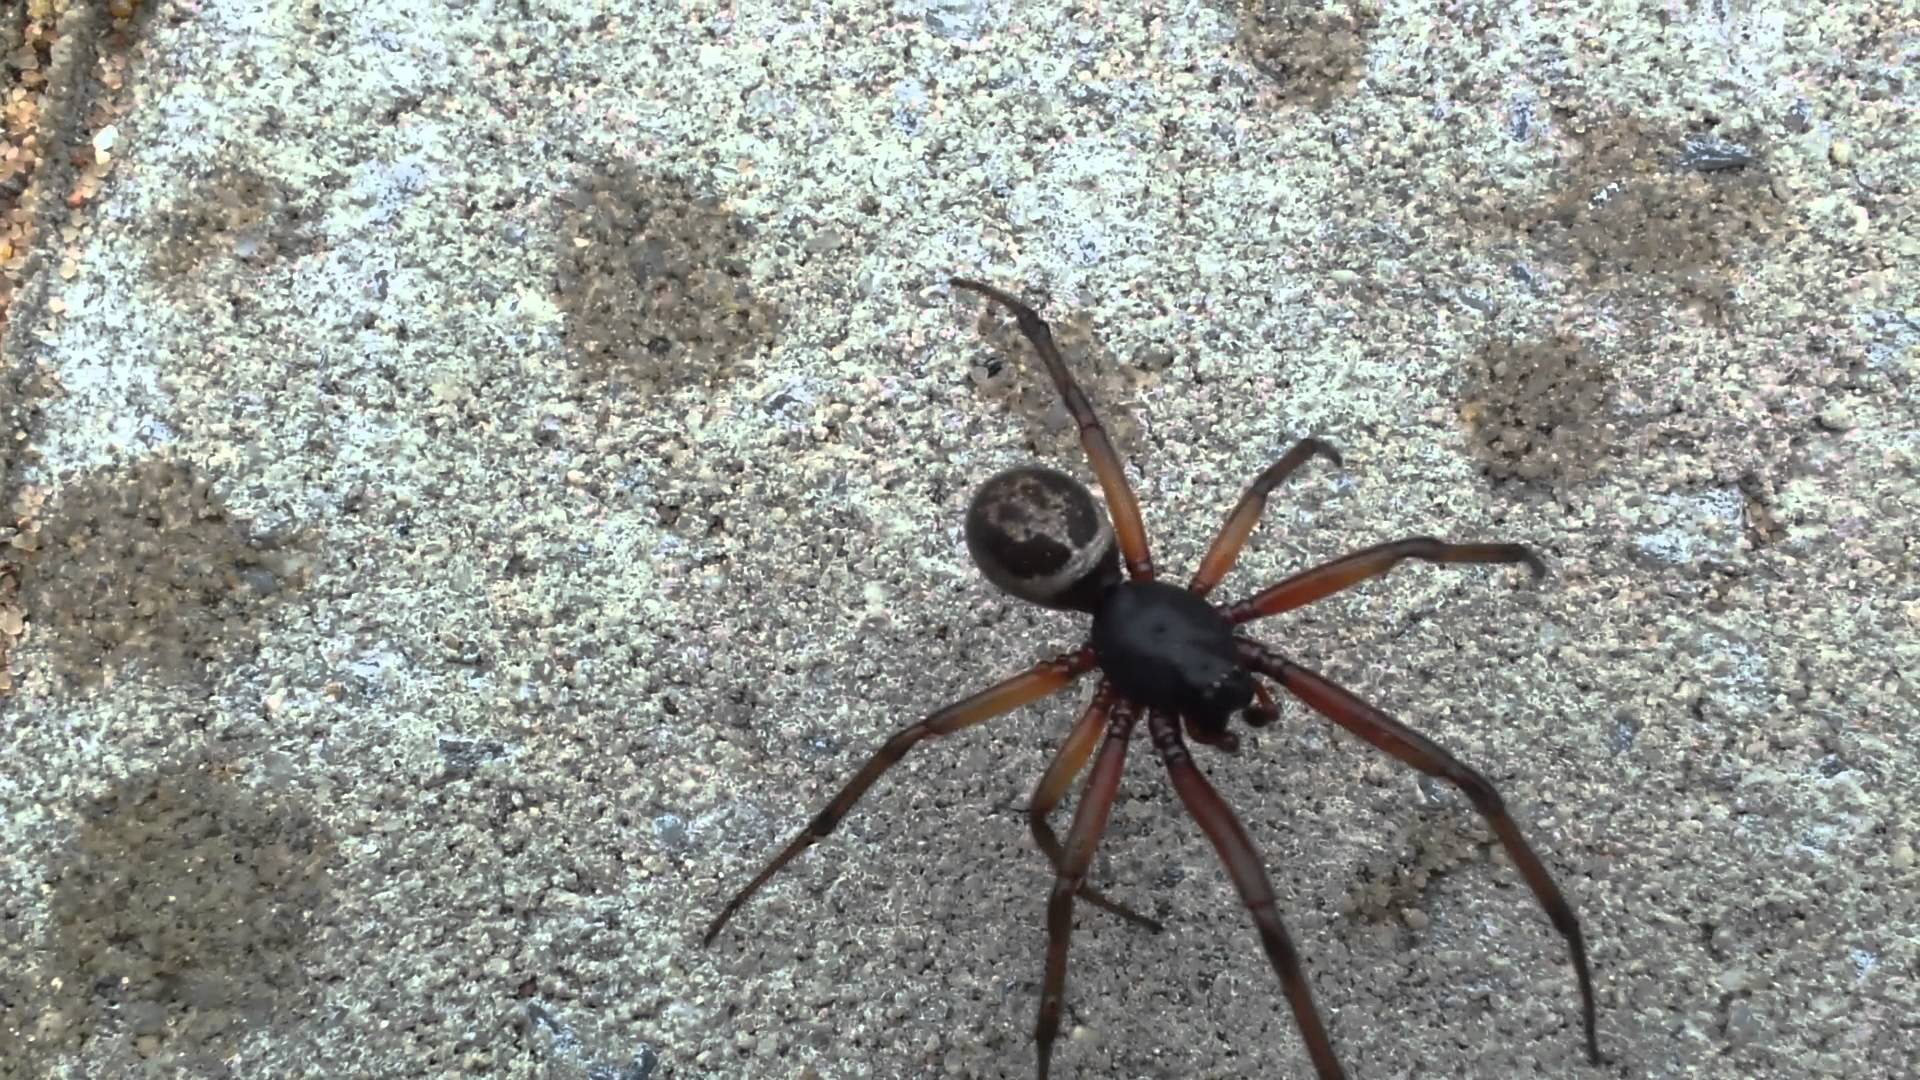 Large spider UK skull markings - YouTube